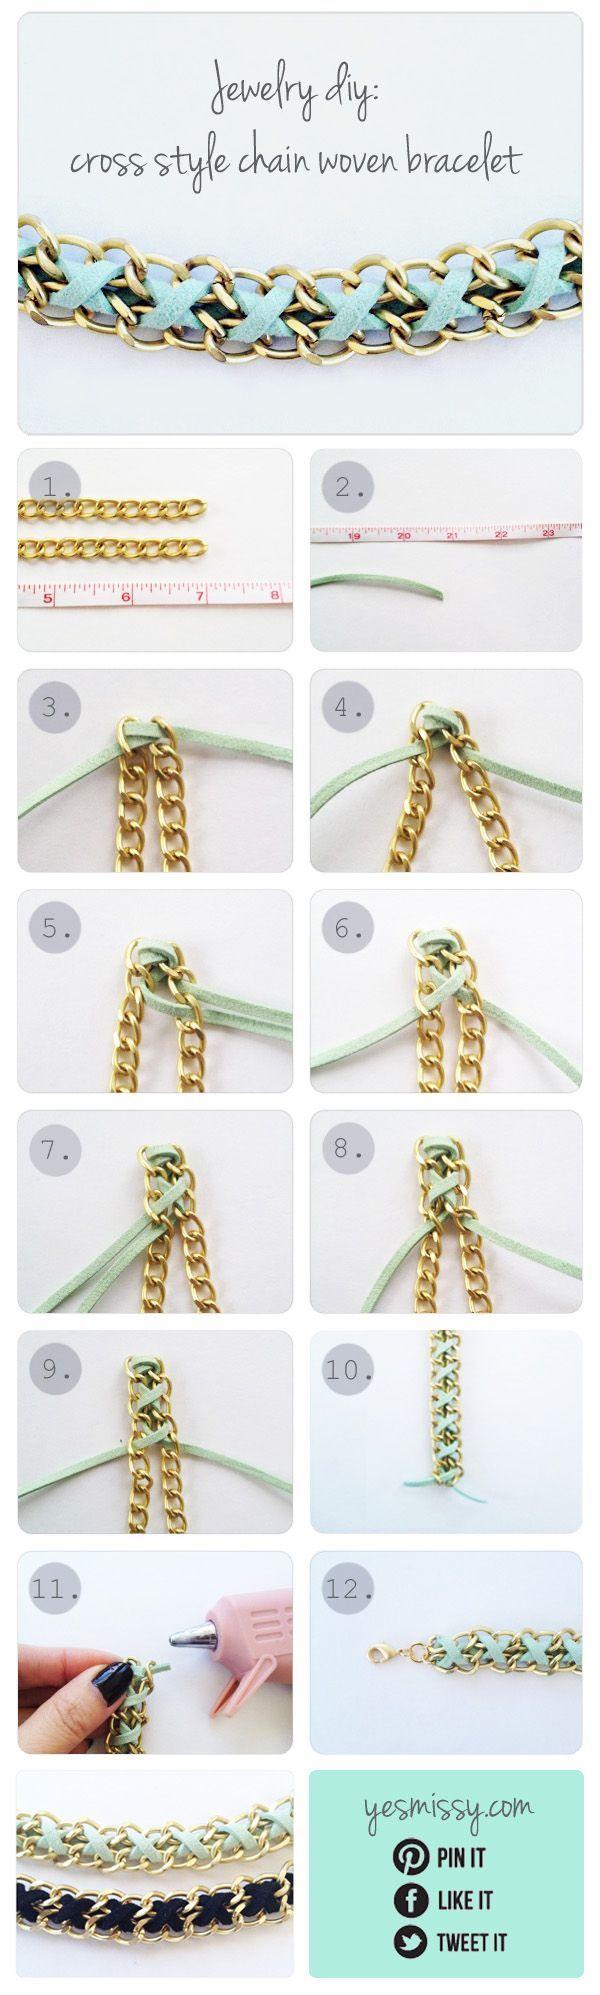 DIY Bracelet - Cross Style Chain Woven Bracelet